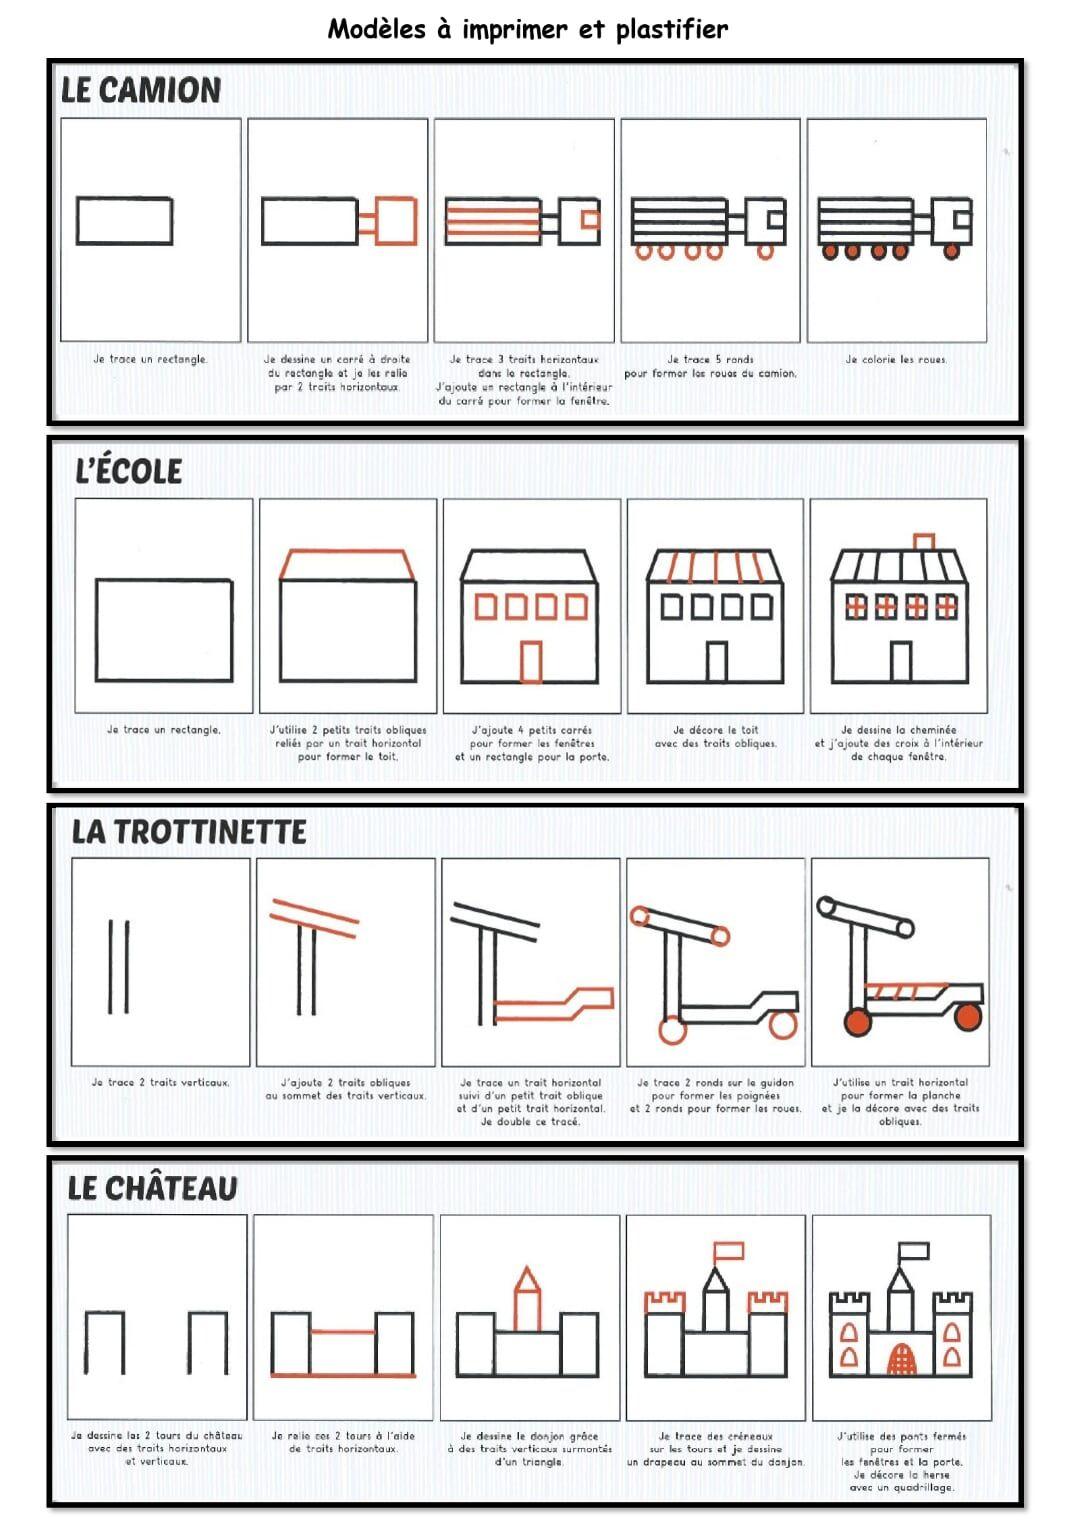 Modèles Dessin Guidé.pdf - Onedrive | Dessin, Modele dedans Maicresse Karine